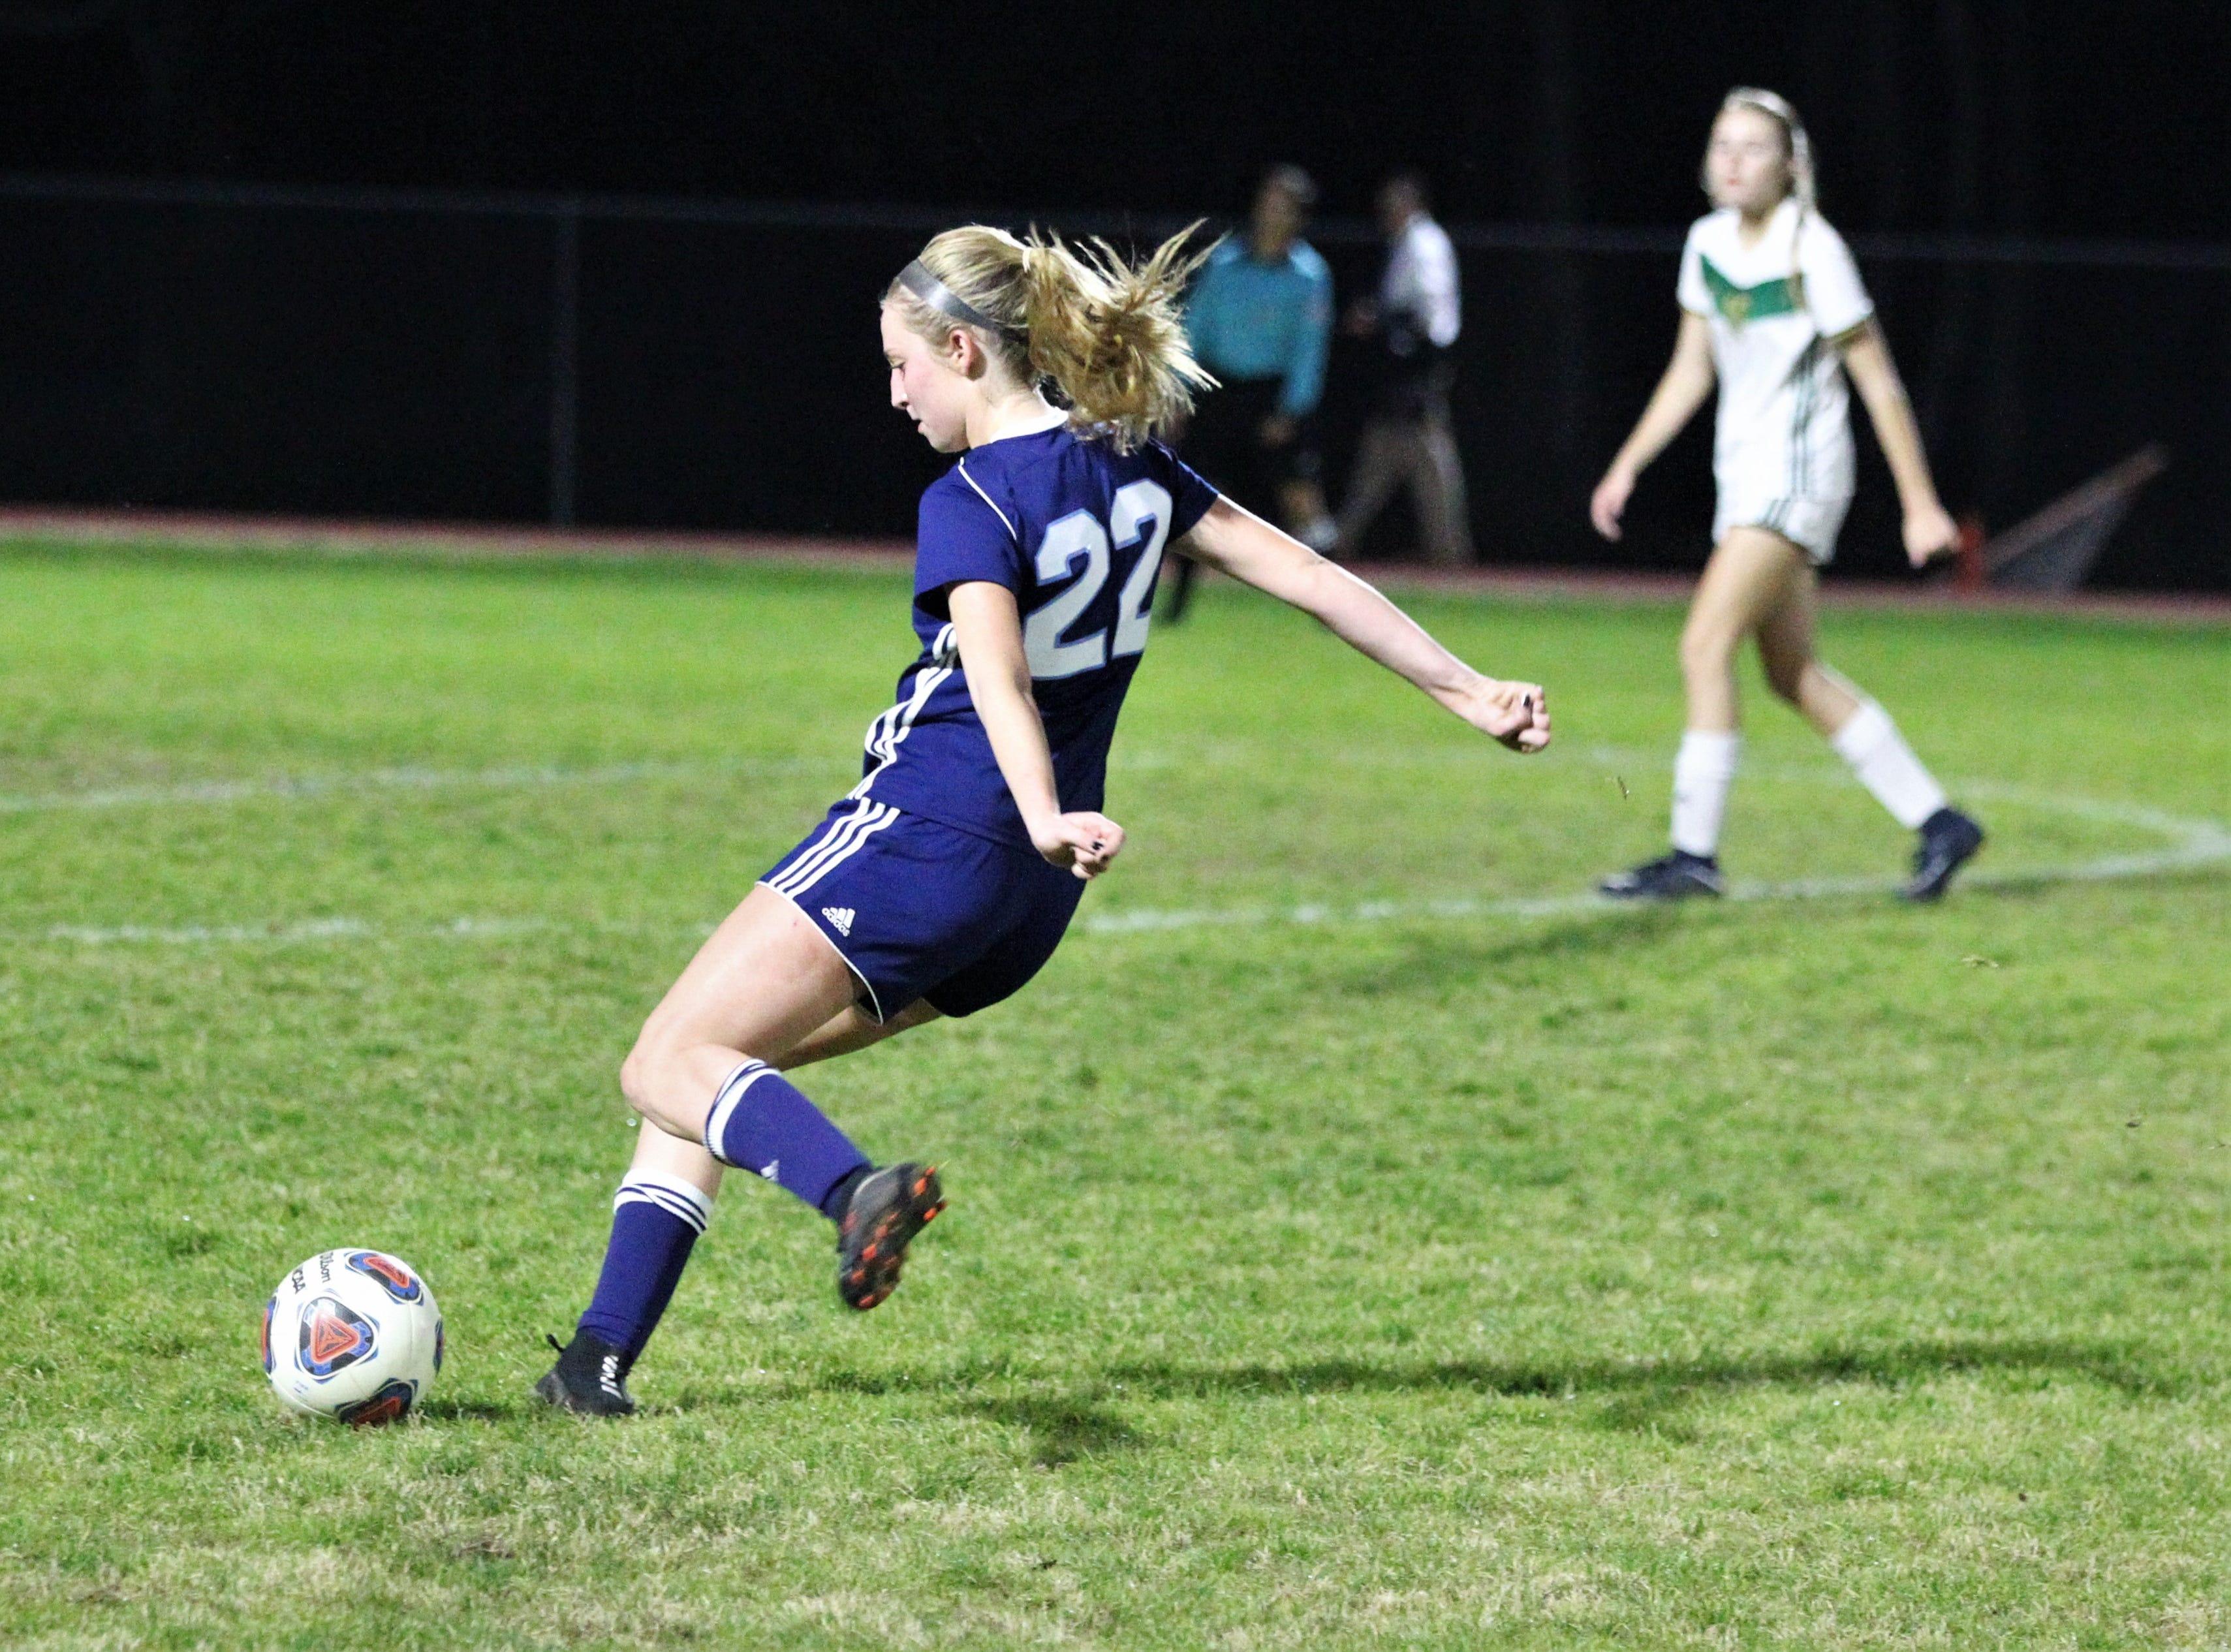 Maclay's Edy Rash takes a shot as Maclay's girls soccer team beat St. Joseph Academy 4-0 in a Region 1-1A quarterfinal on Jan. 5, 2019.